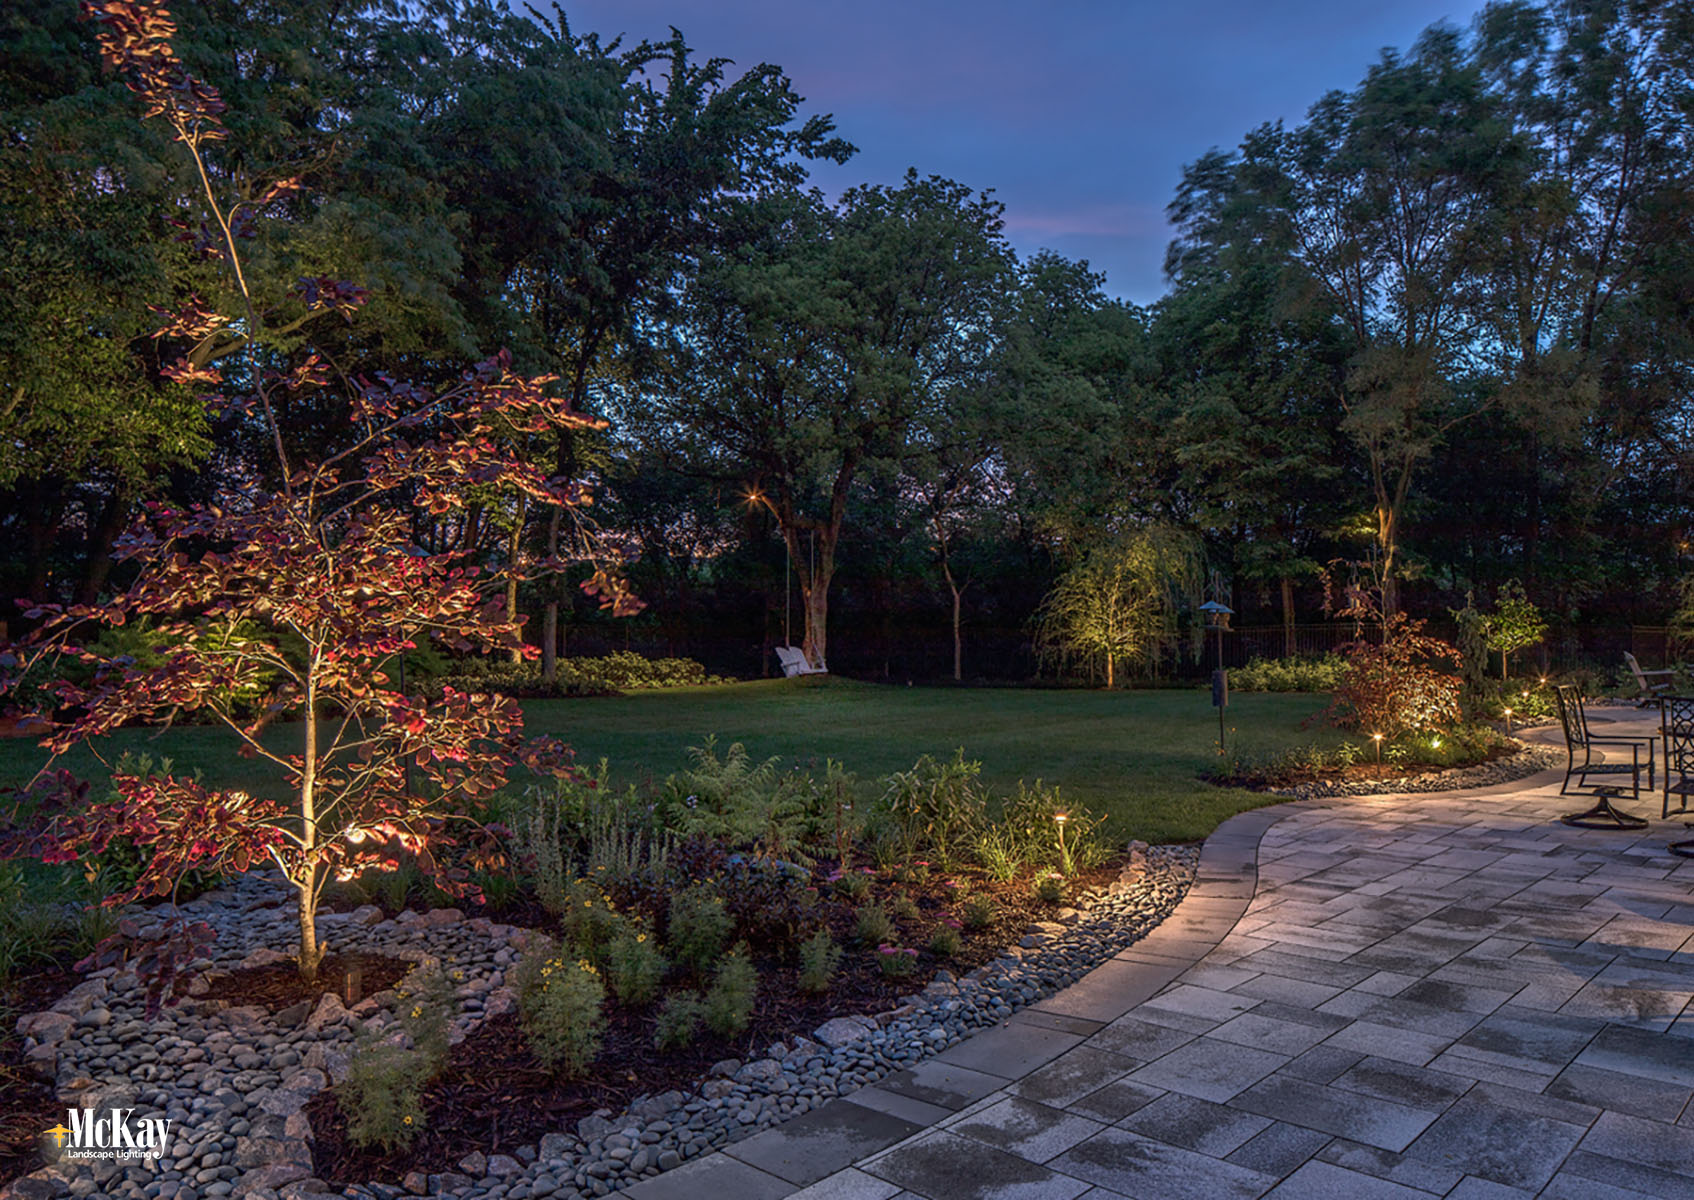 Landscape Lighting Design: Outdoor Patio Lighting Elkhorn Nebraska | McKay Landscape Lighting